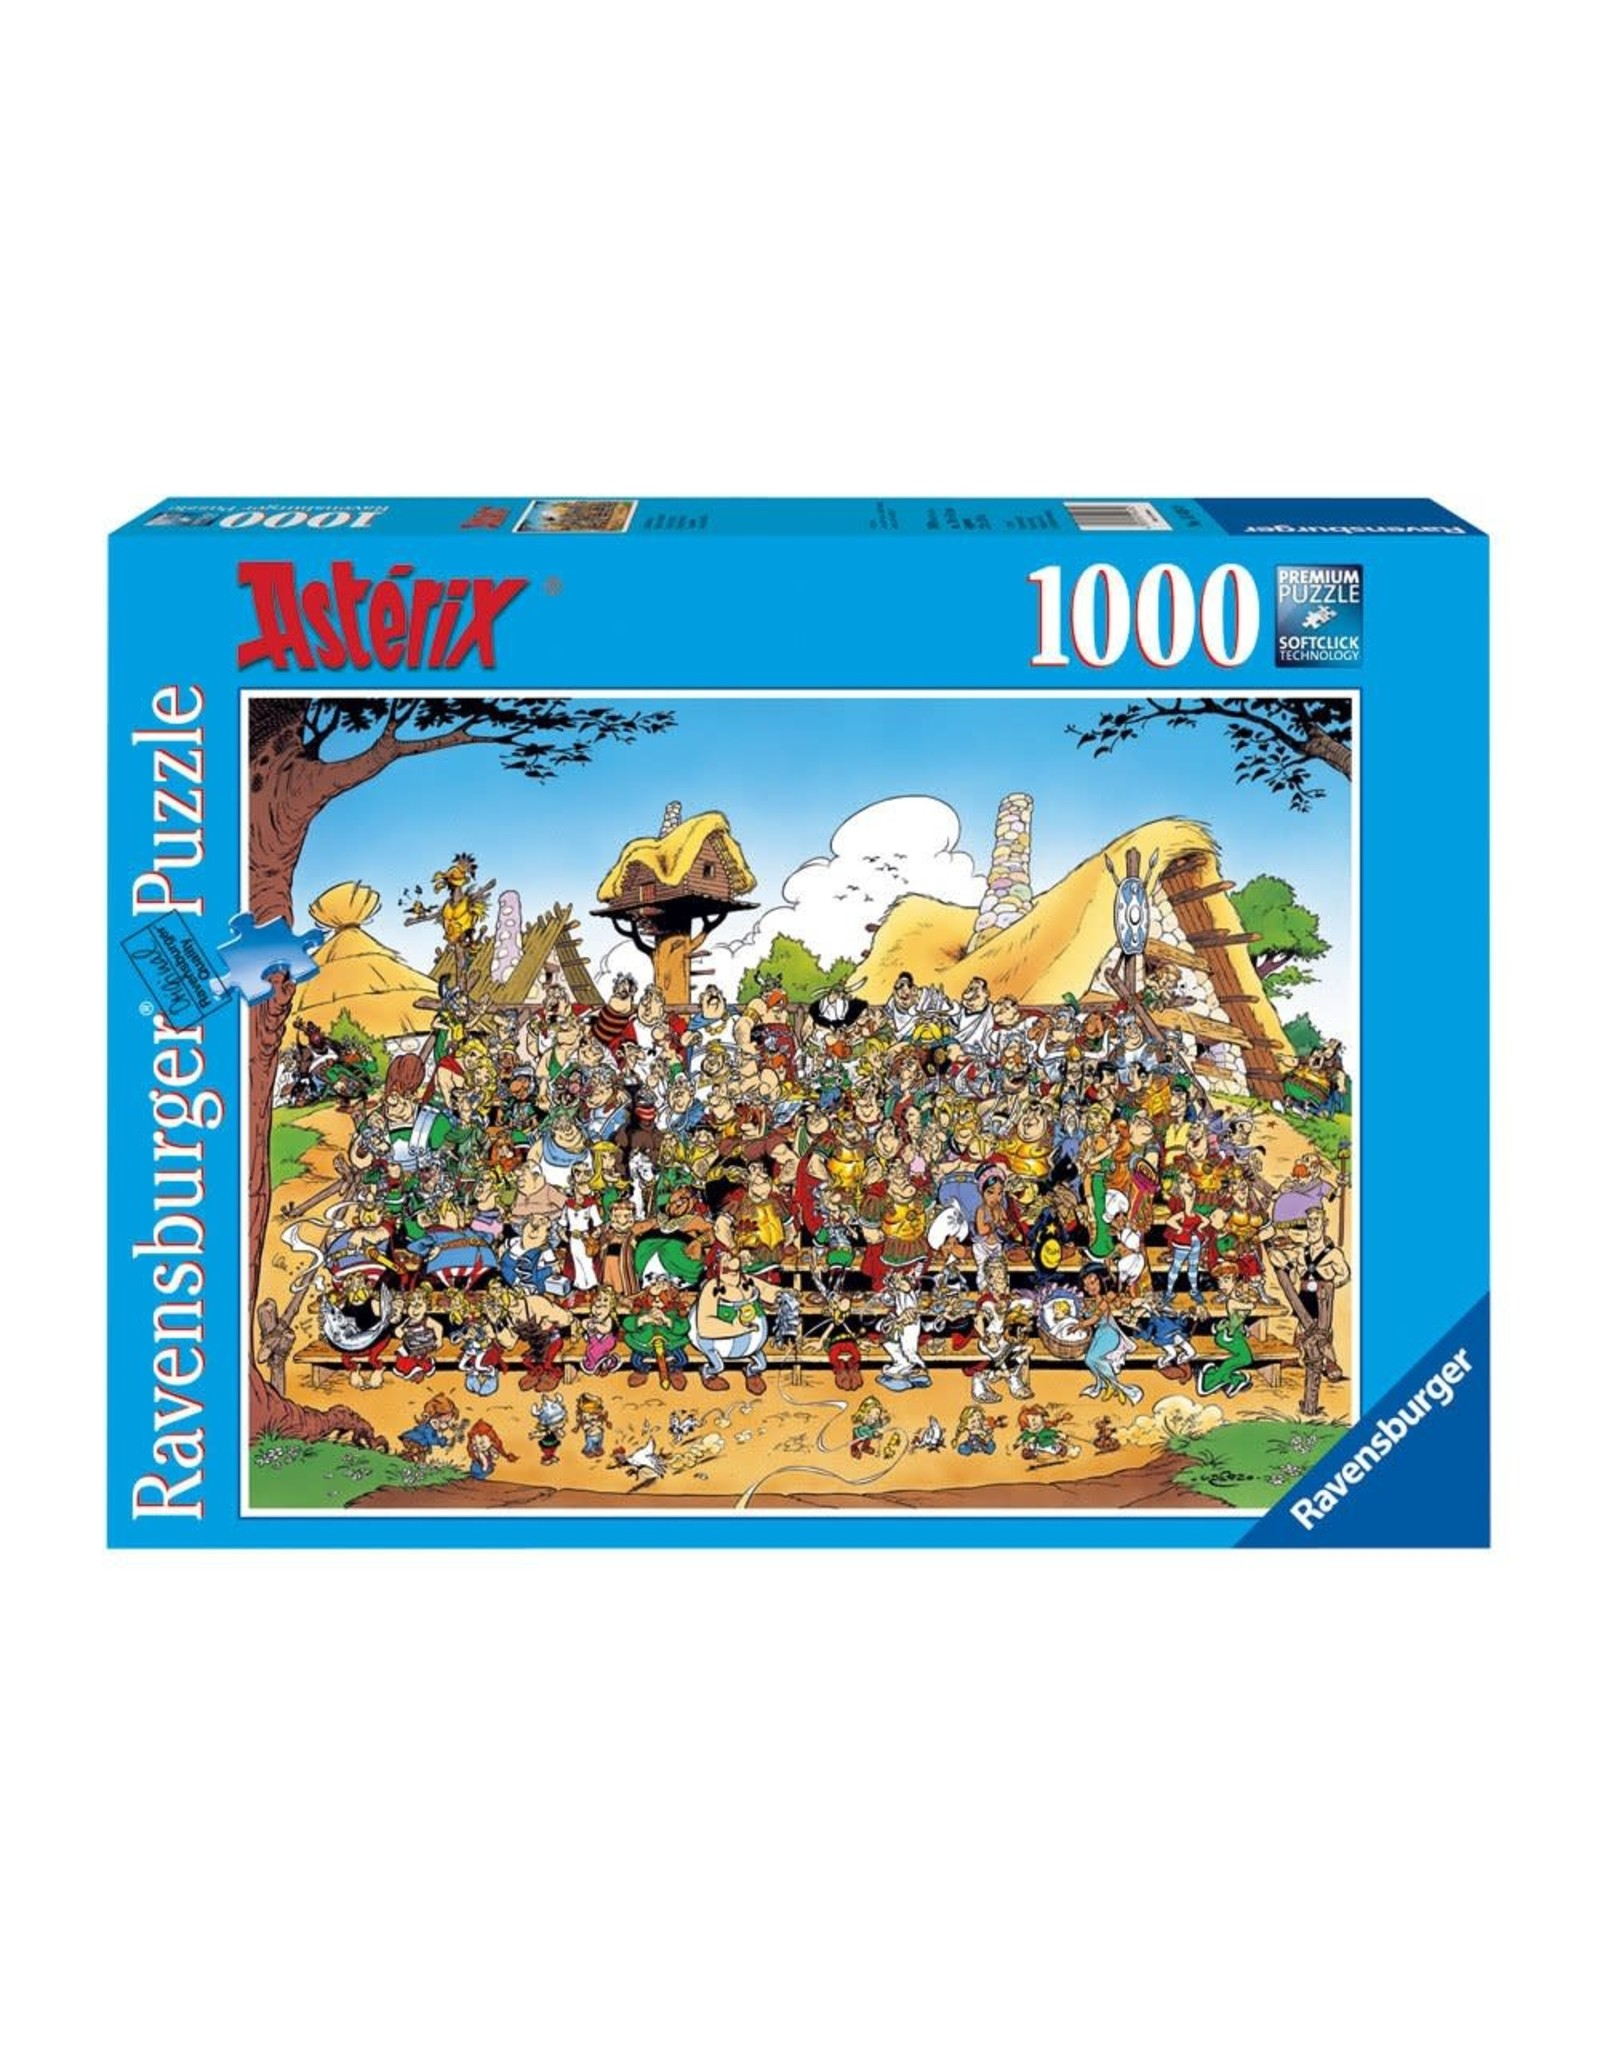 Ravensburger ASTERIX Puzzle 1000P - Family Photo